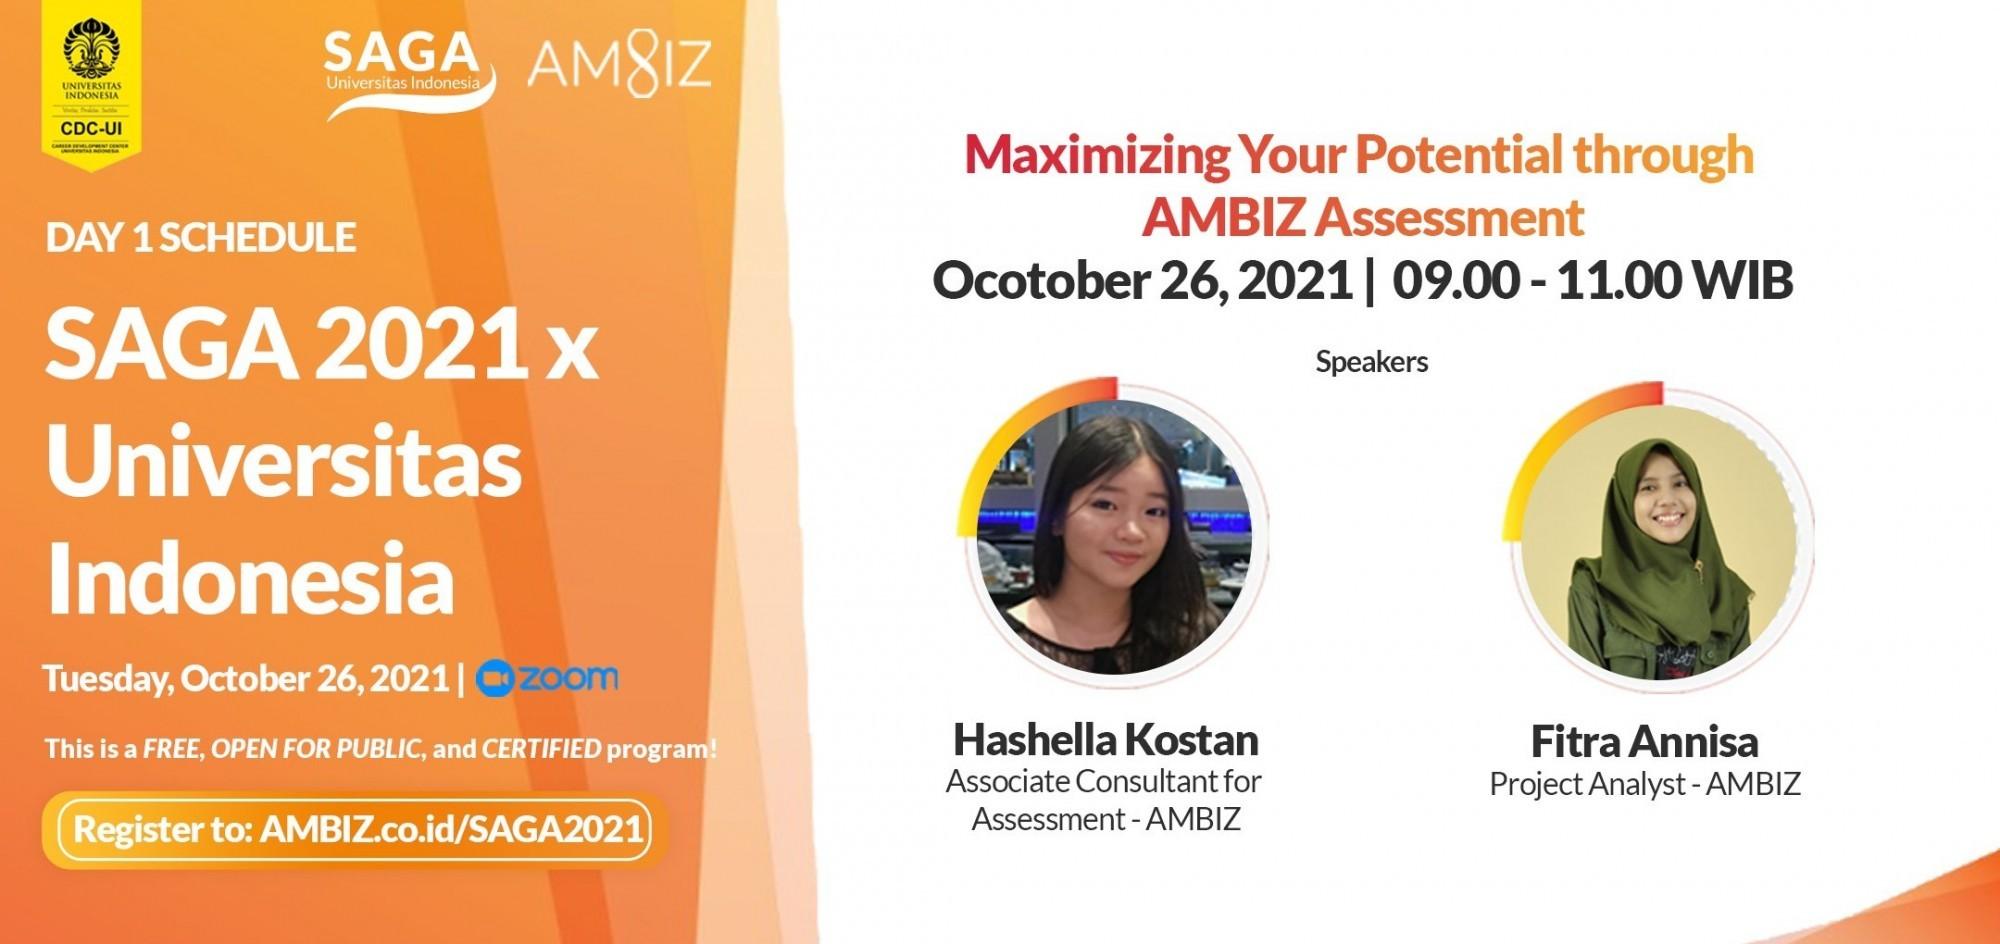 [SAGA x UI] Maximizing Your Potential through AMBIZ Assessment